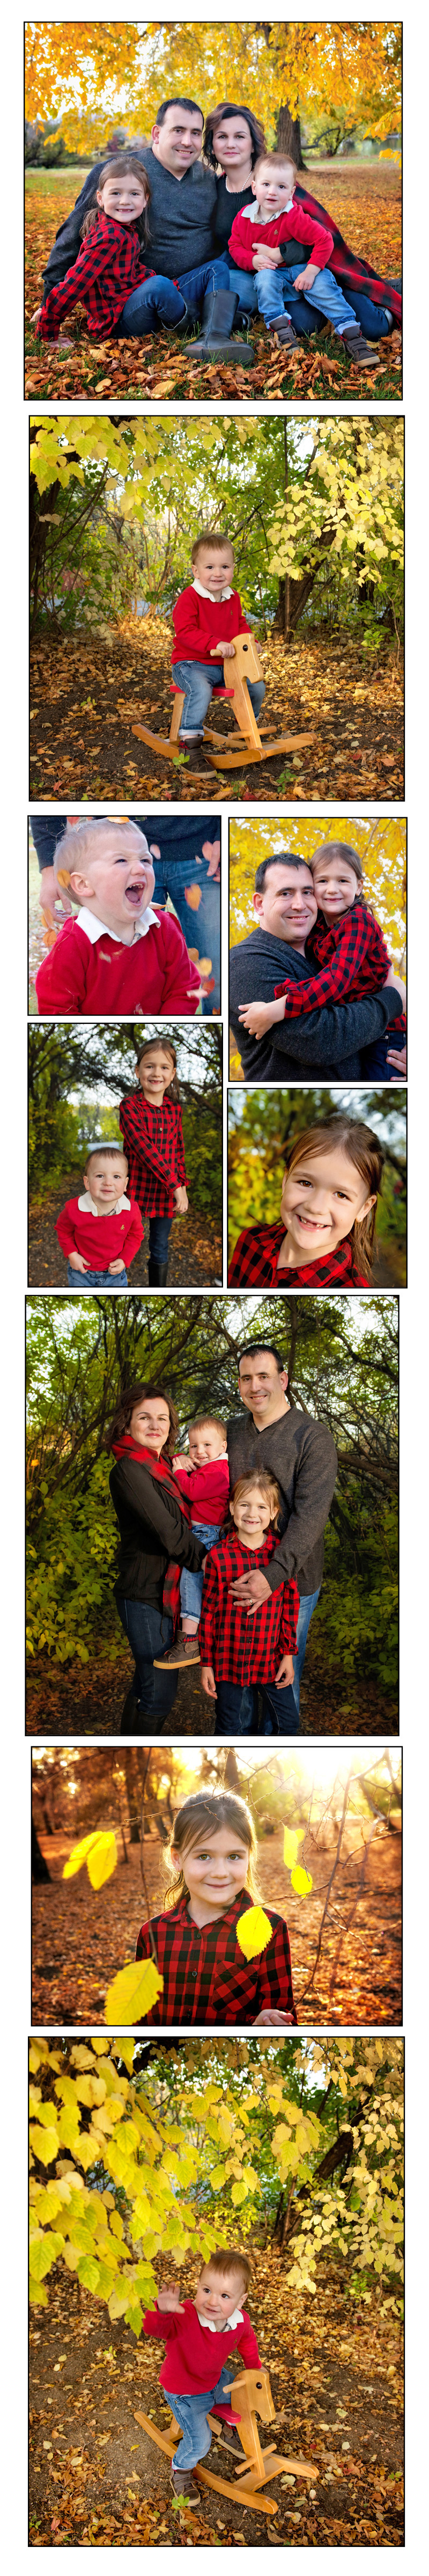 regina-family-photographer-free-lense-photo-01.jpg